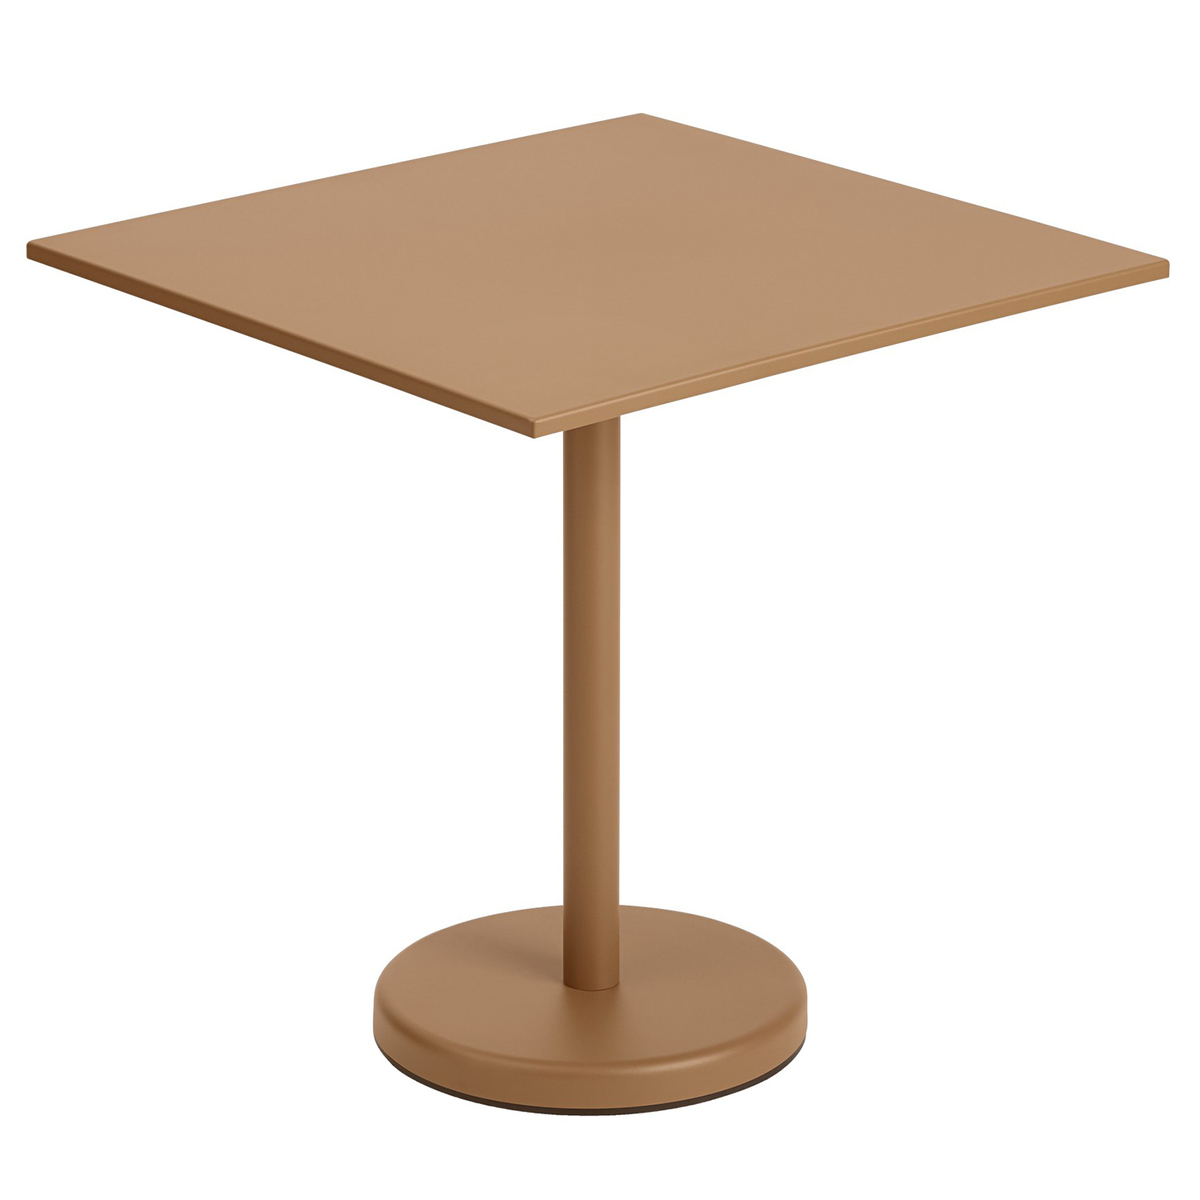 Muuto Linear Steel Café Table 70 X 70 Cm, Burnt Orange